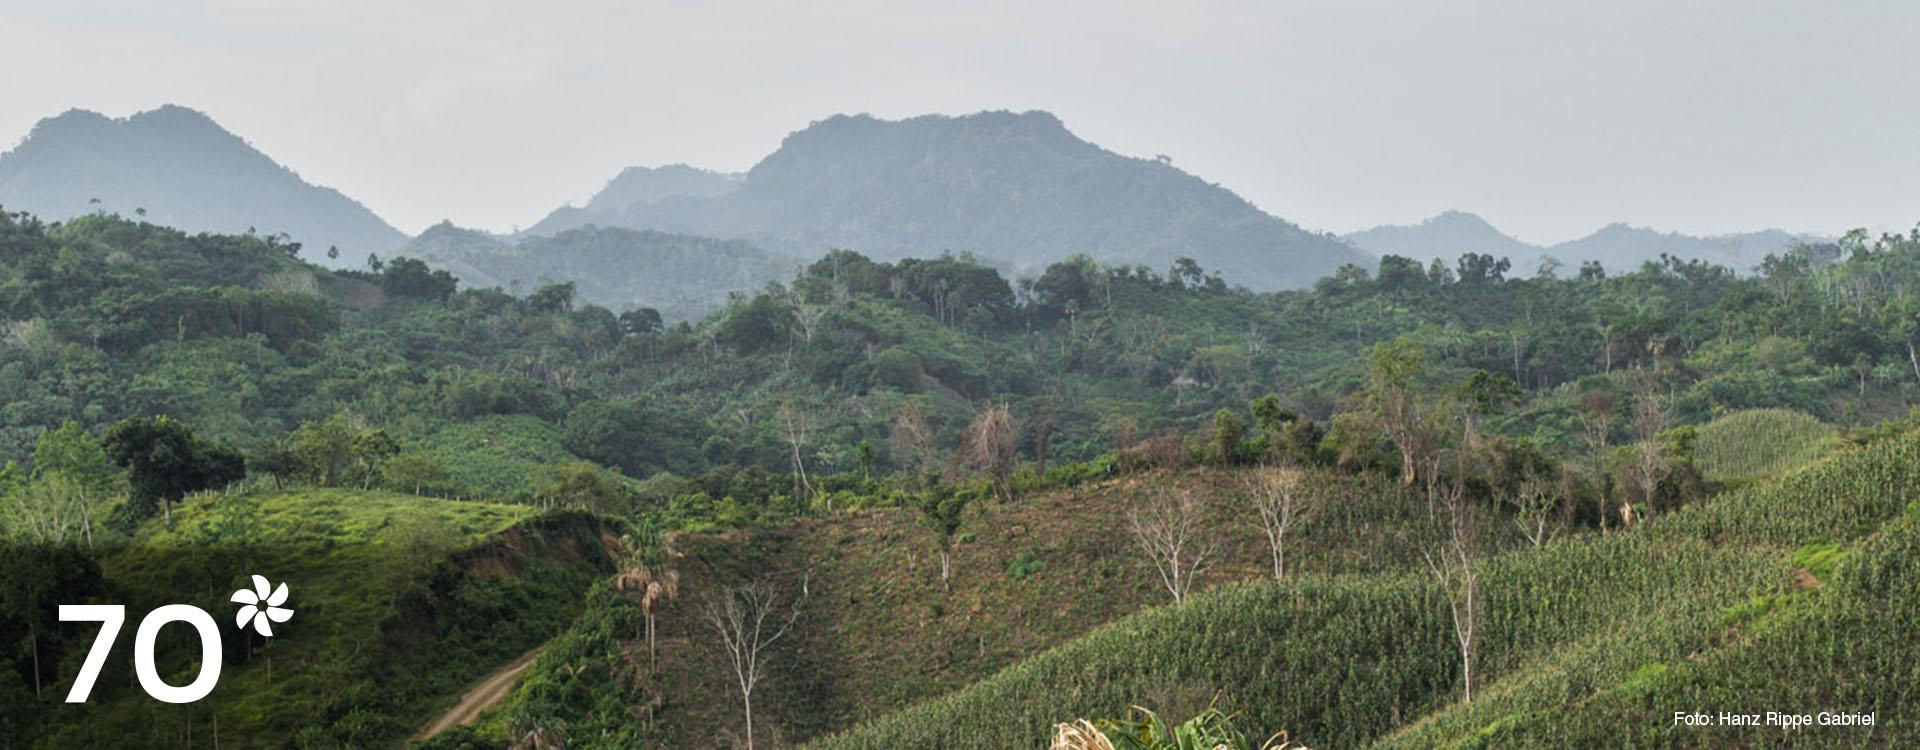 Imagen de campo colombiano. Foto: Hanz Rippe Gabriel.